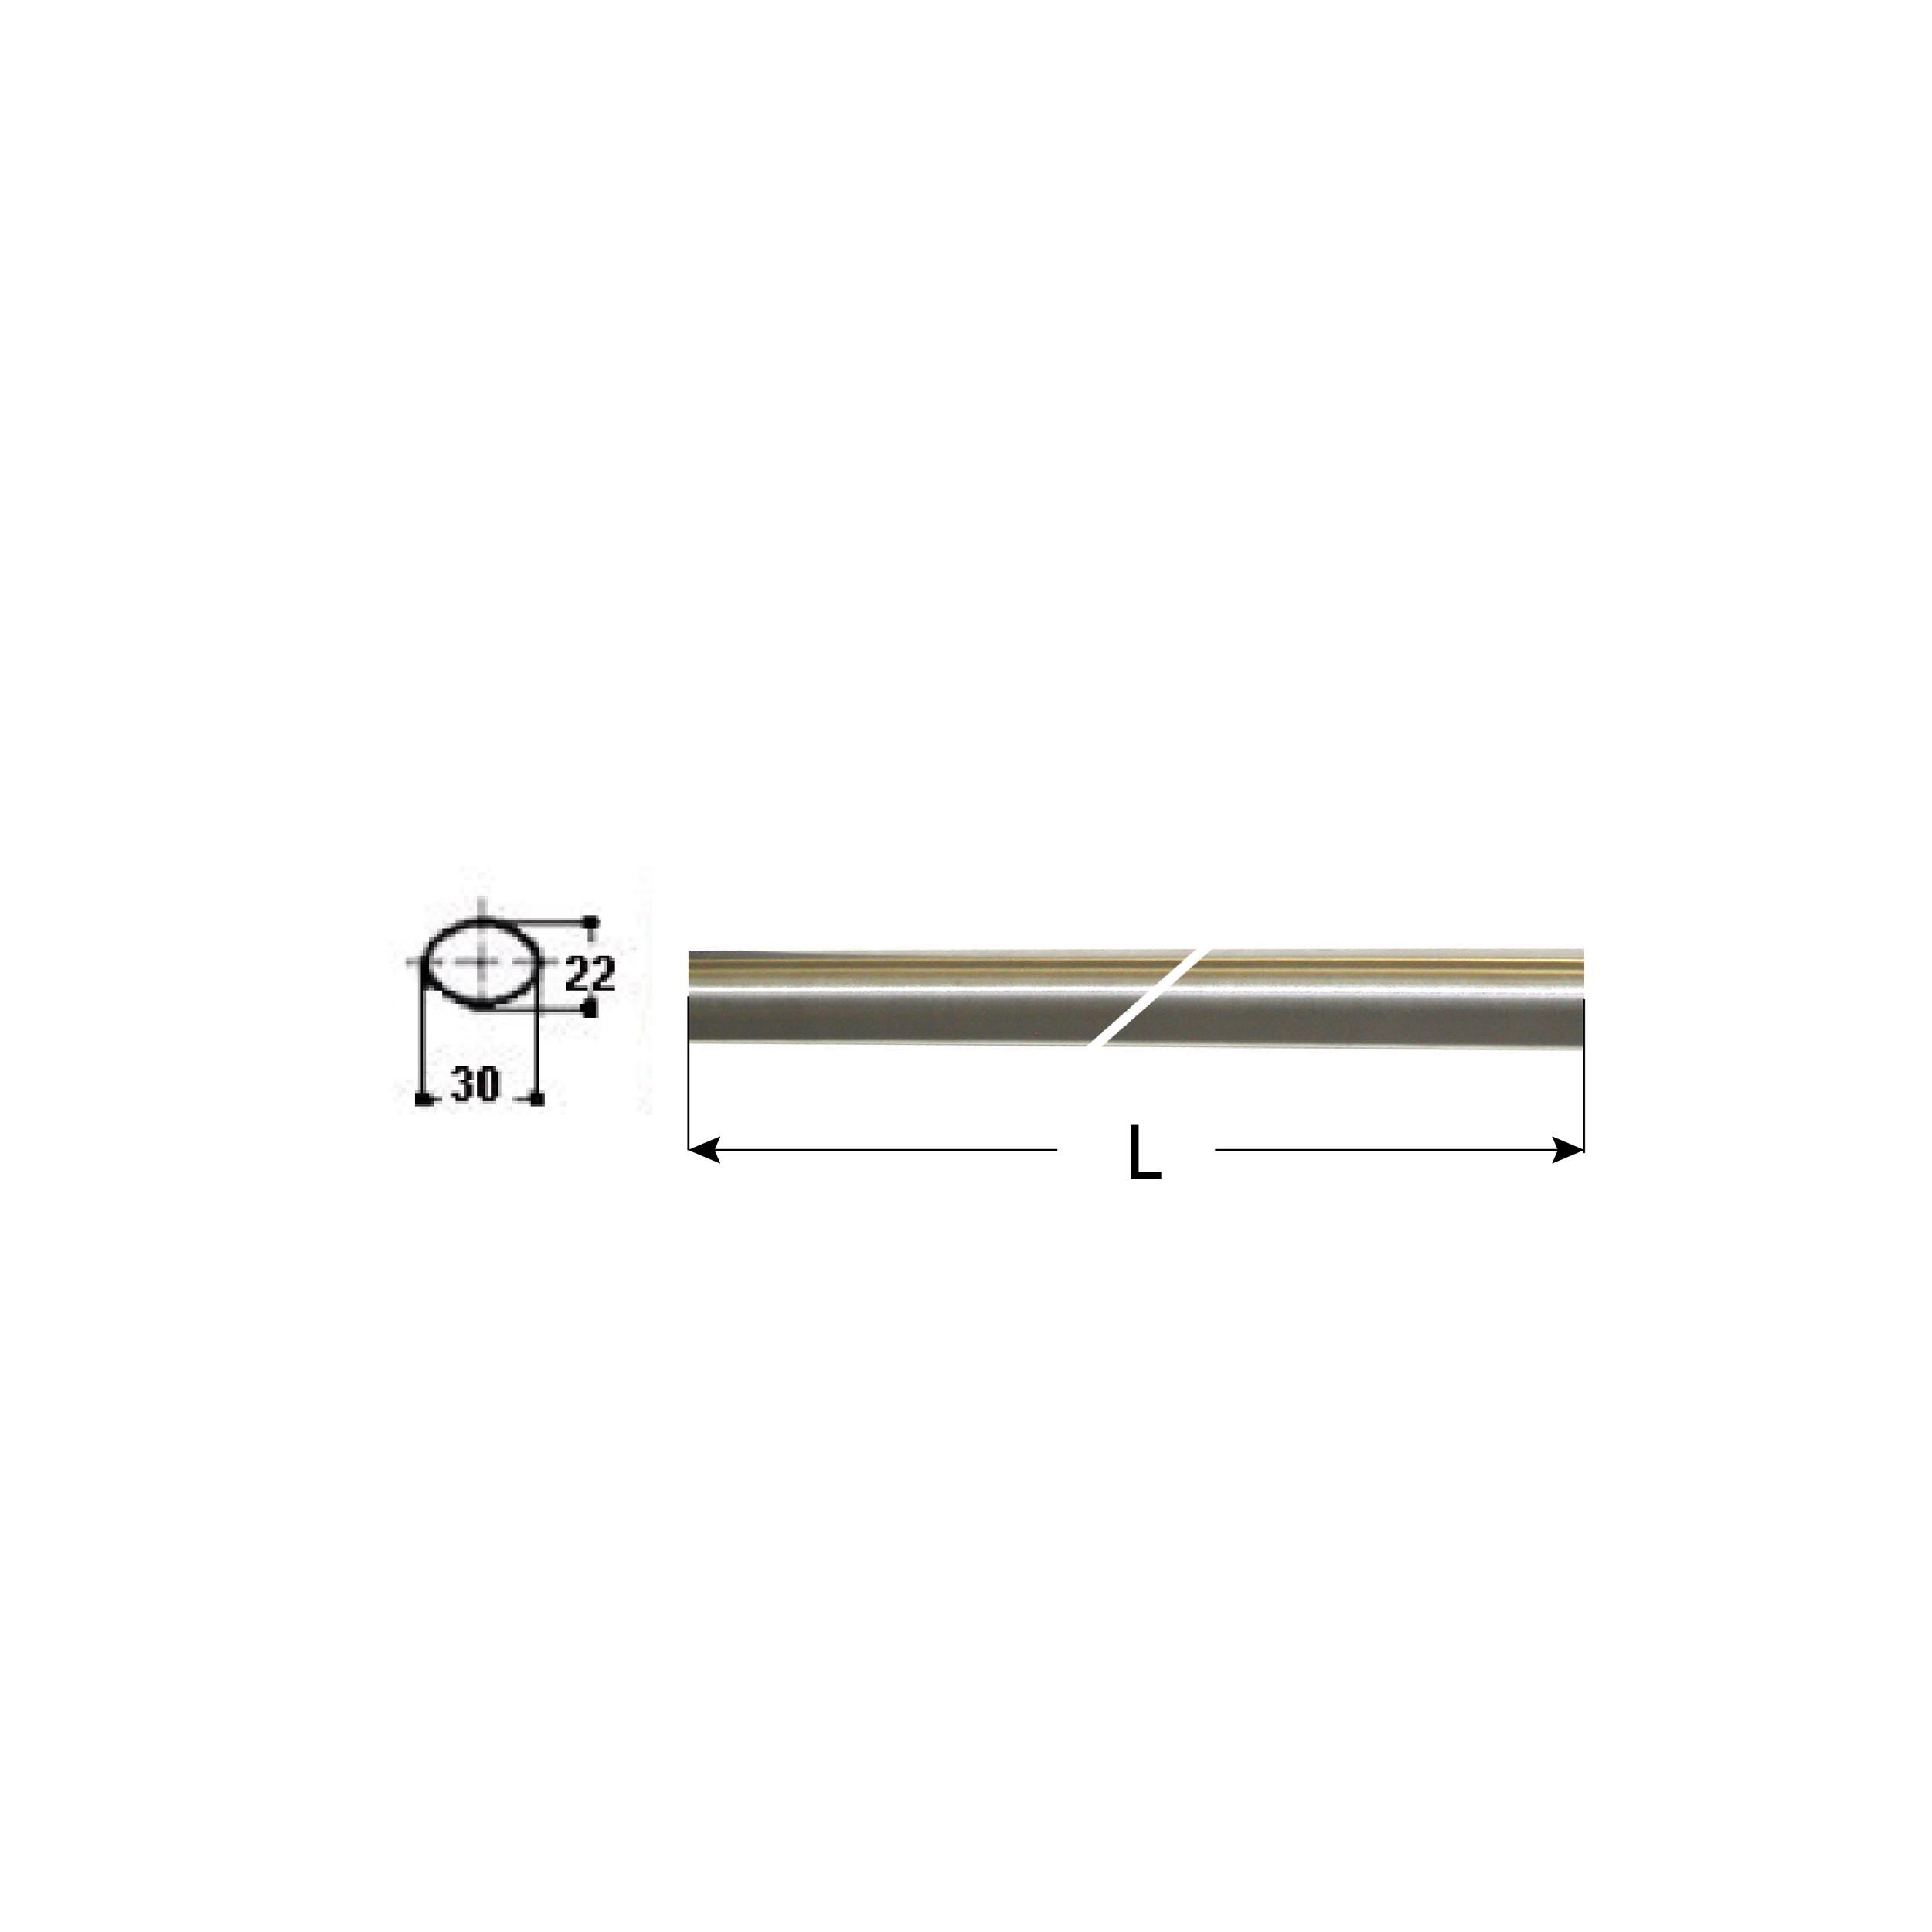 BARRE ORIZZONTALI mm. 900 INOX